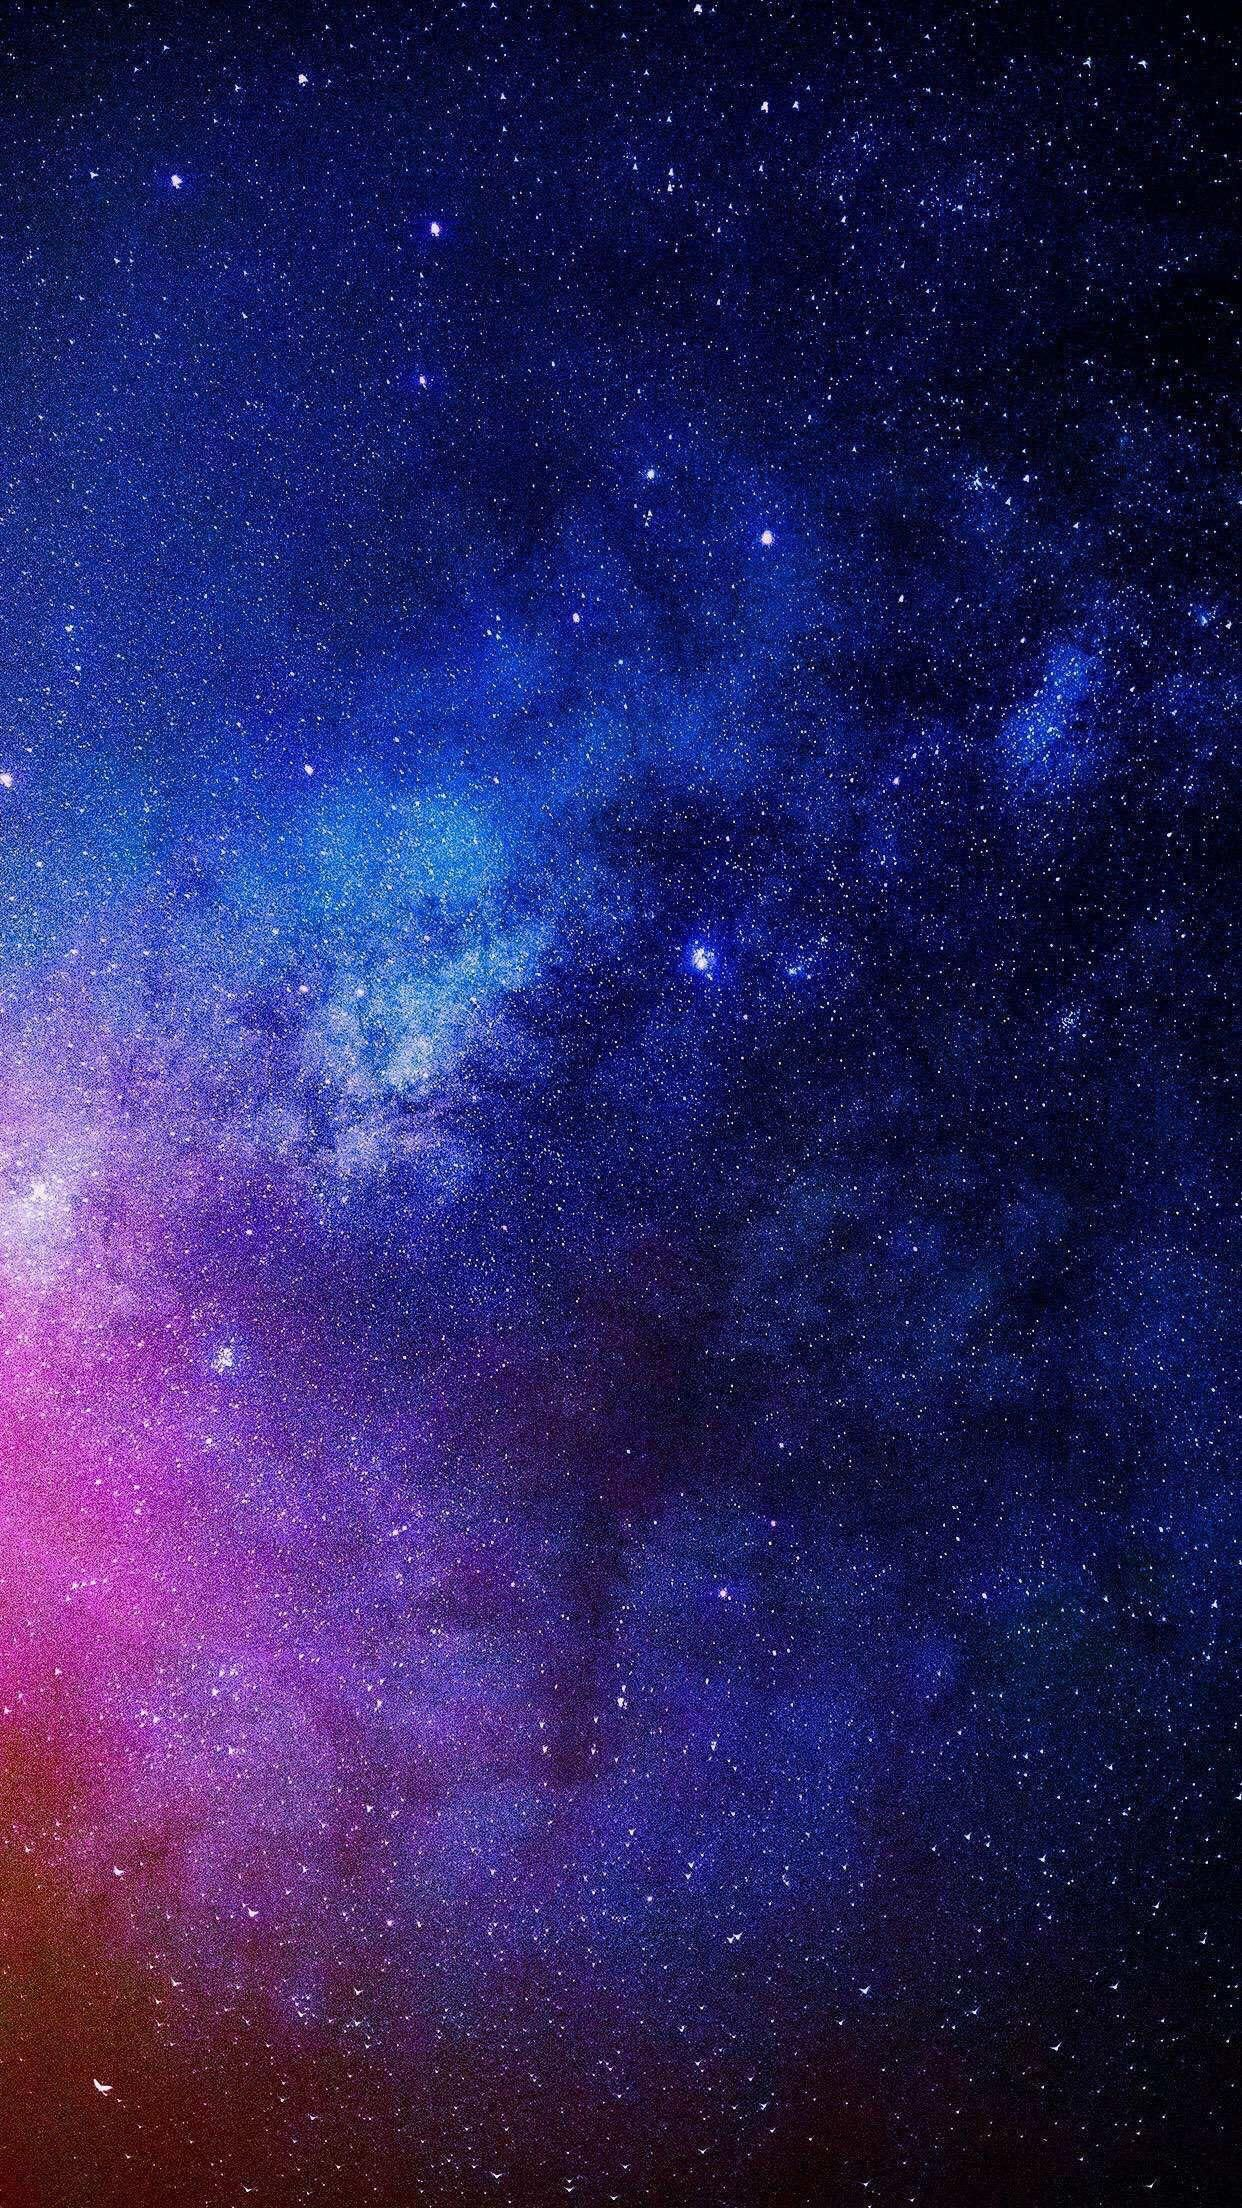 Galaxy Discover Zen Wall Art For Sale Ebay Galaxy Wallpaper Purple Galaxy Wallpaper Cute Galaxy Wallpaper